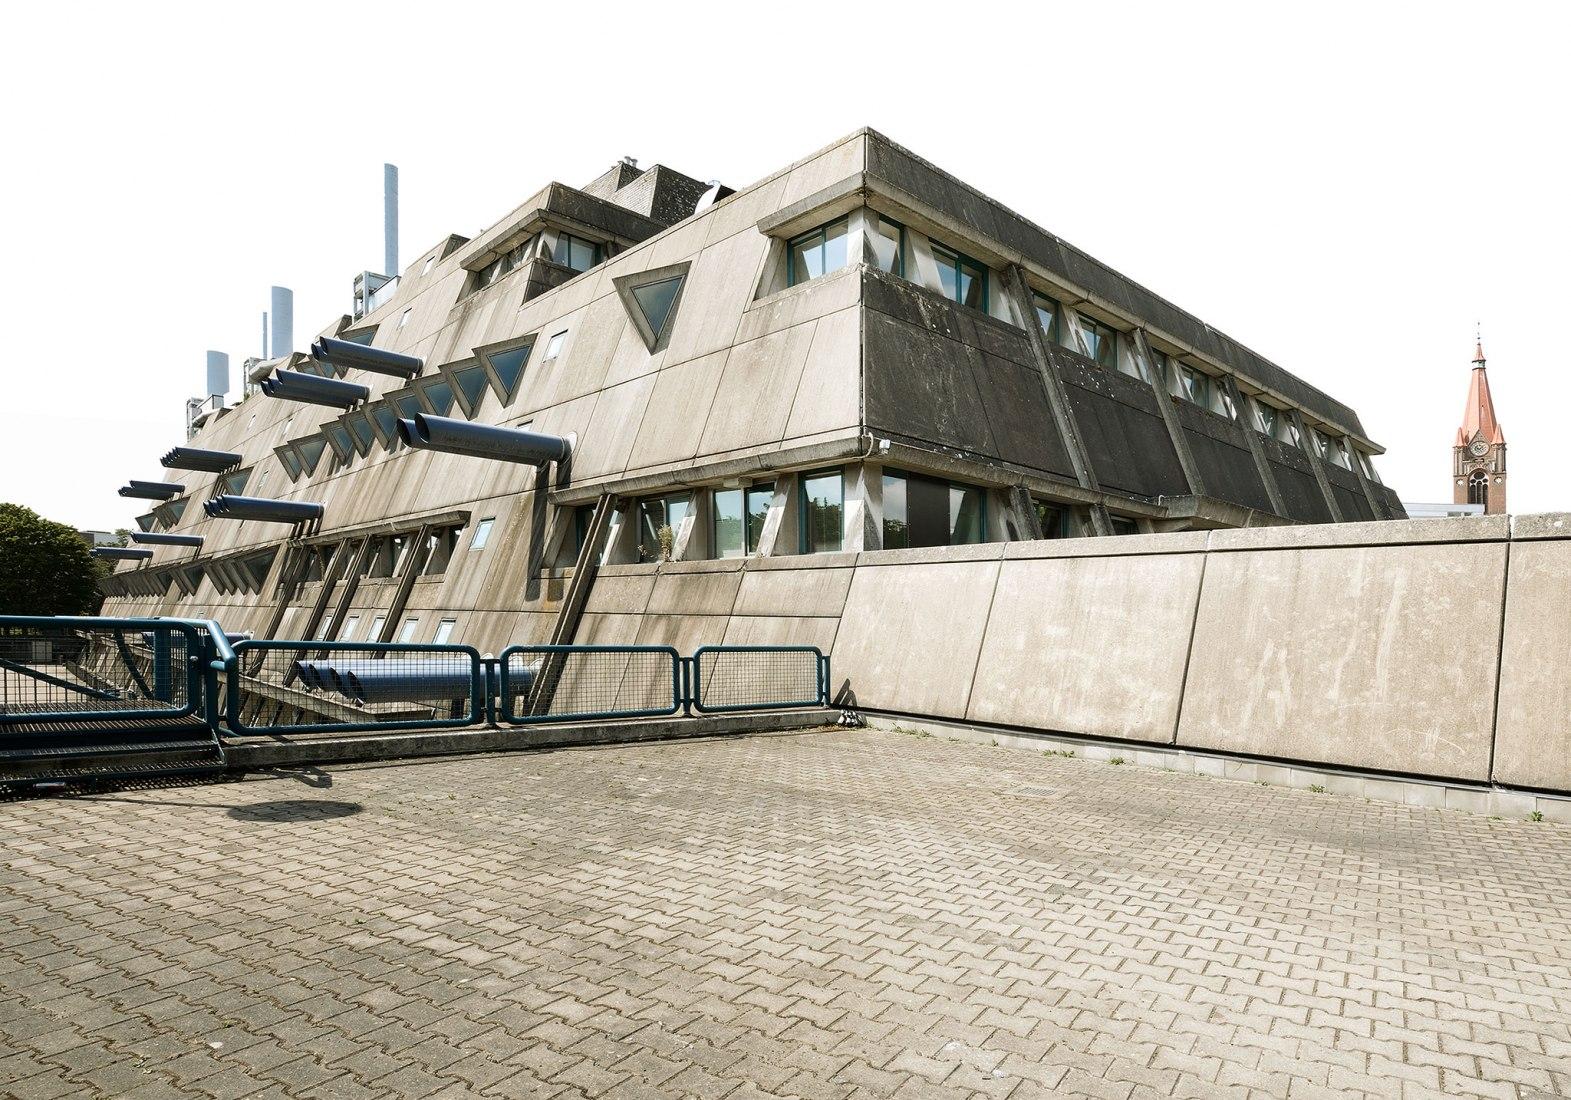 Experimental Setup BERLIN. Mäusebunker, 2020. Fotografía por Kay Fingerle.